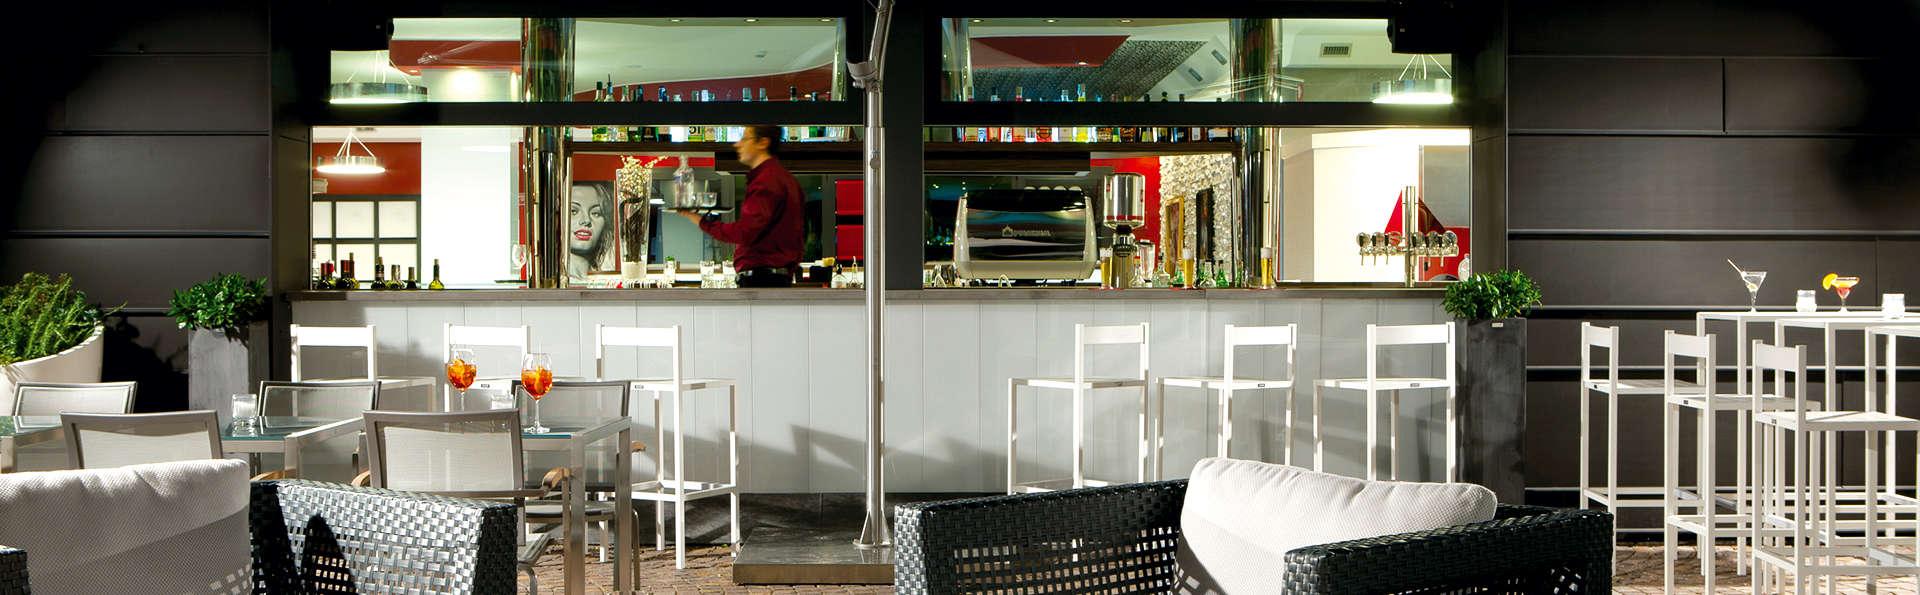 Best Western Plus Quid Hotel Venice Mestre - Edit_Terrace2.jpg